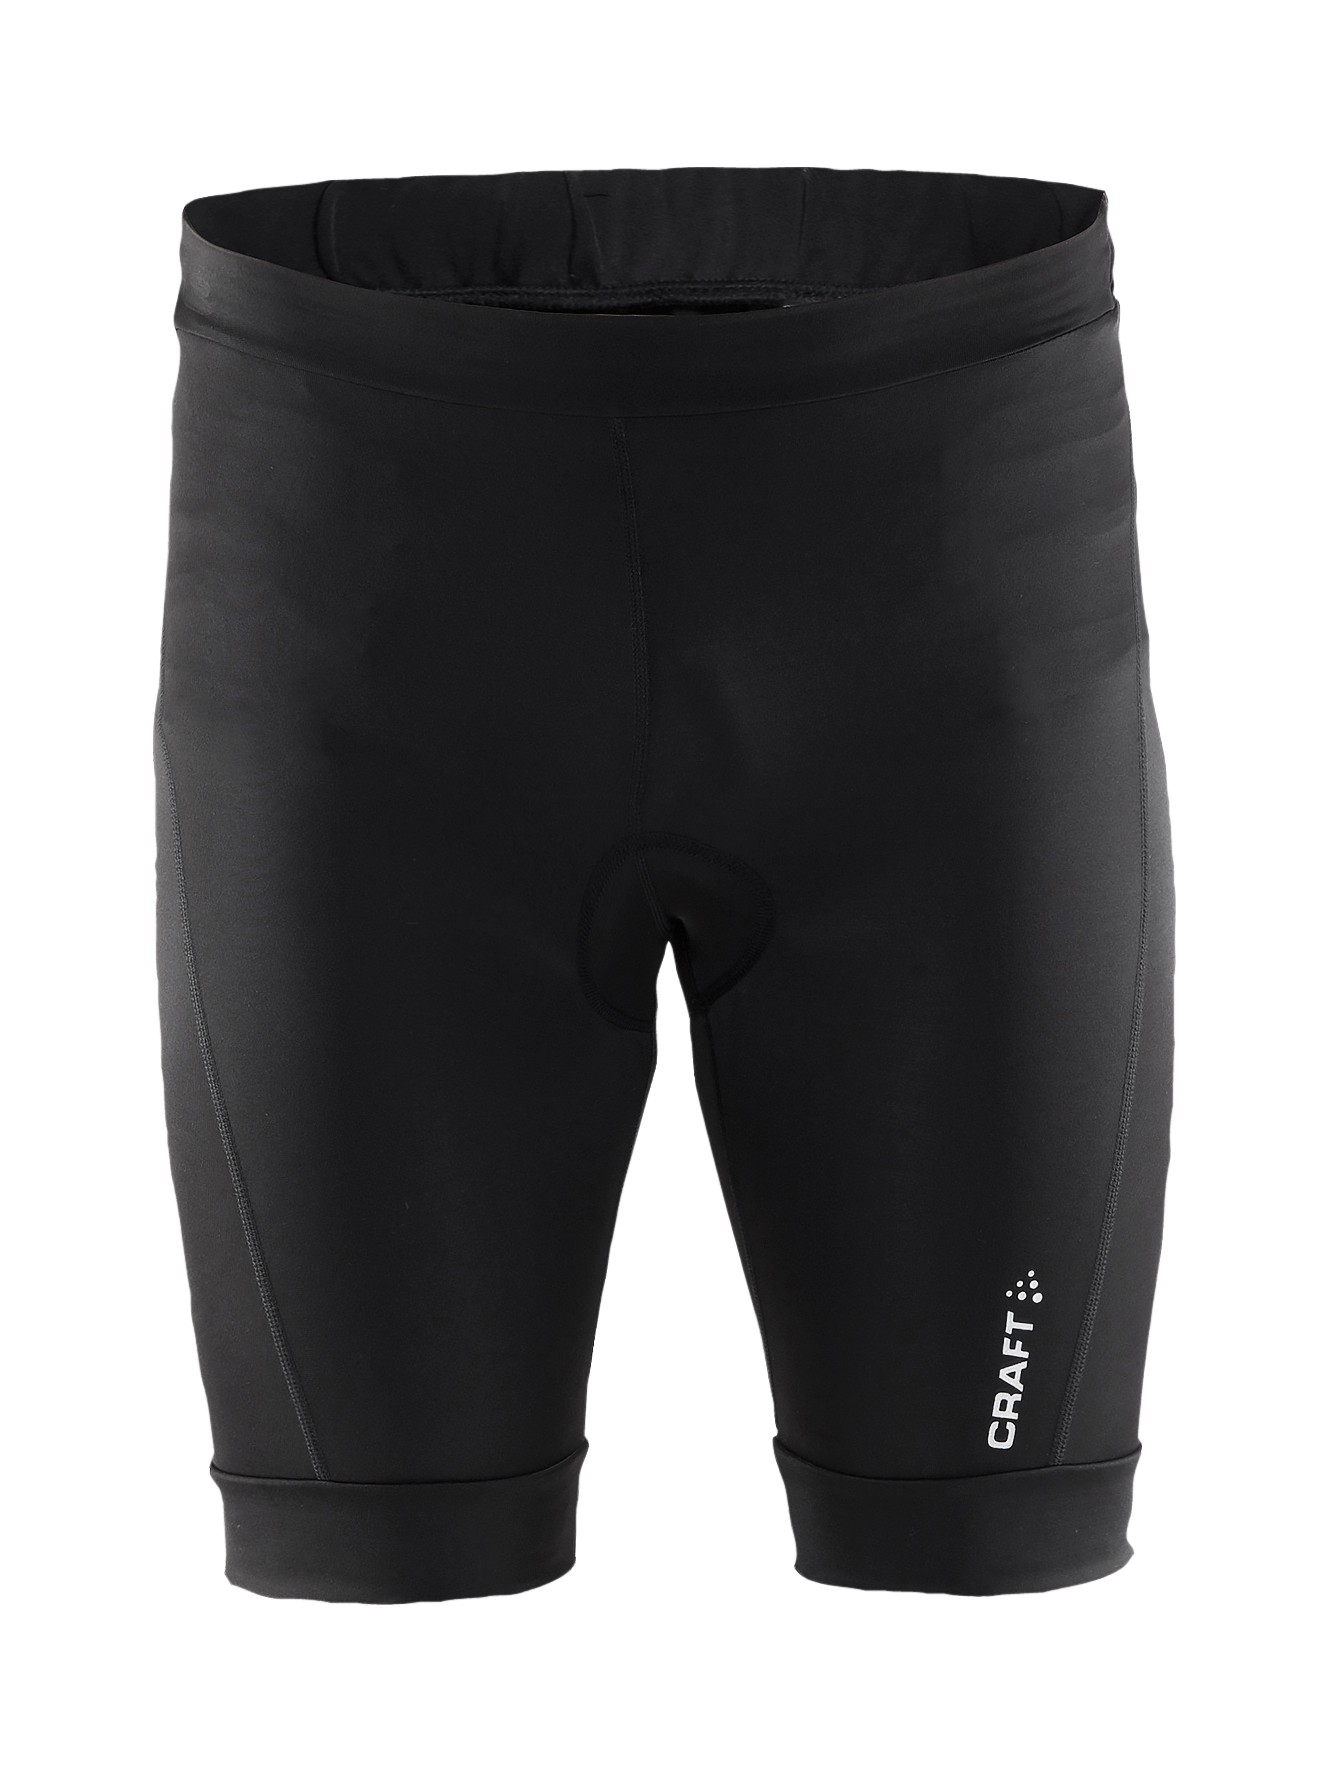 Balance shorts M -pyöräilyhousut